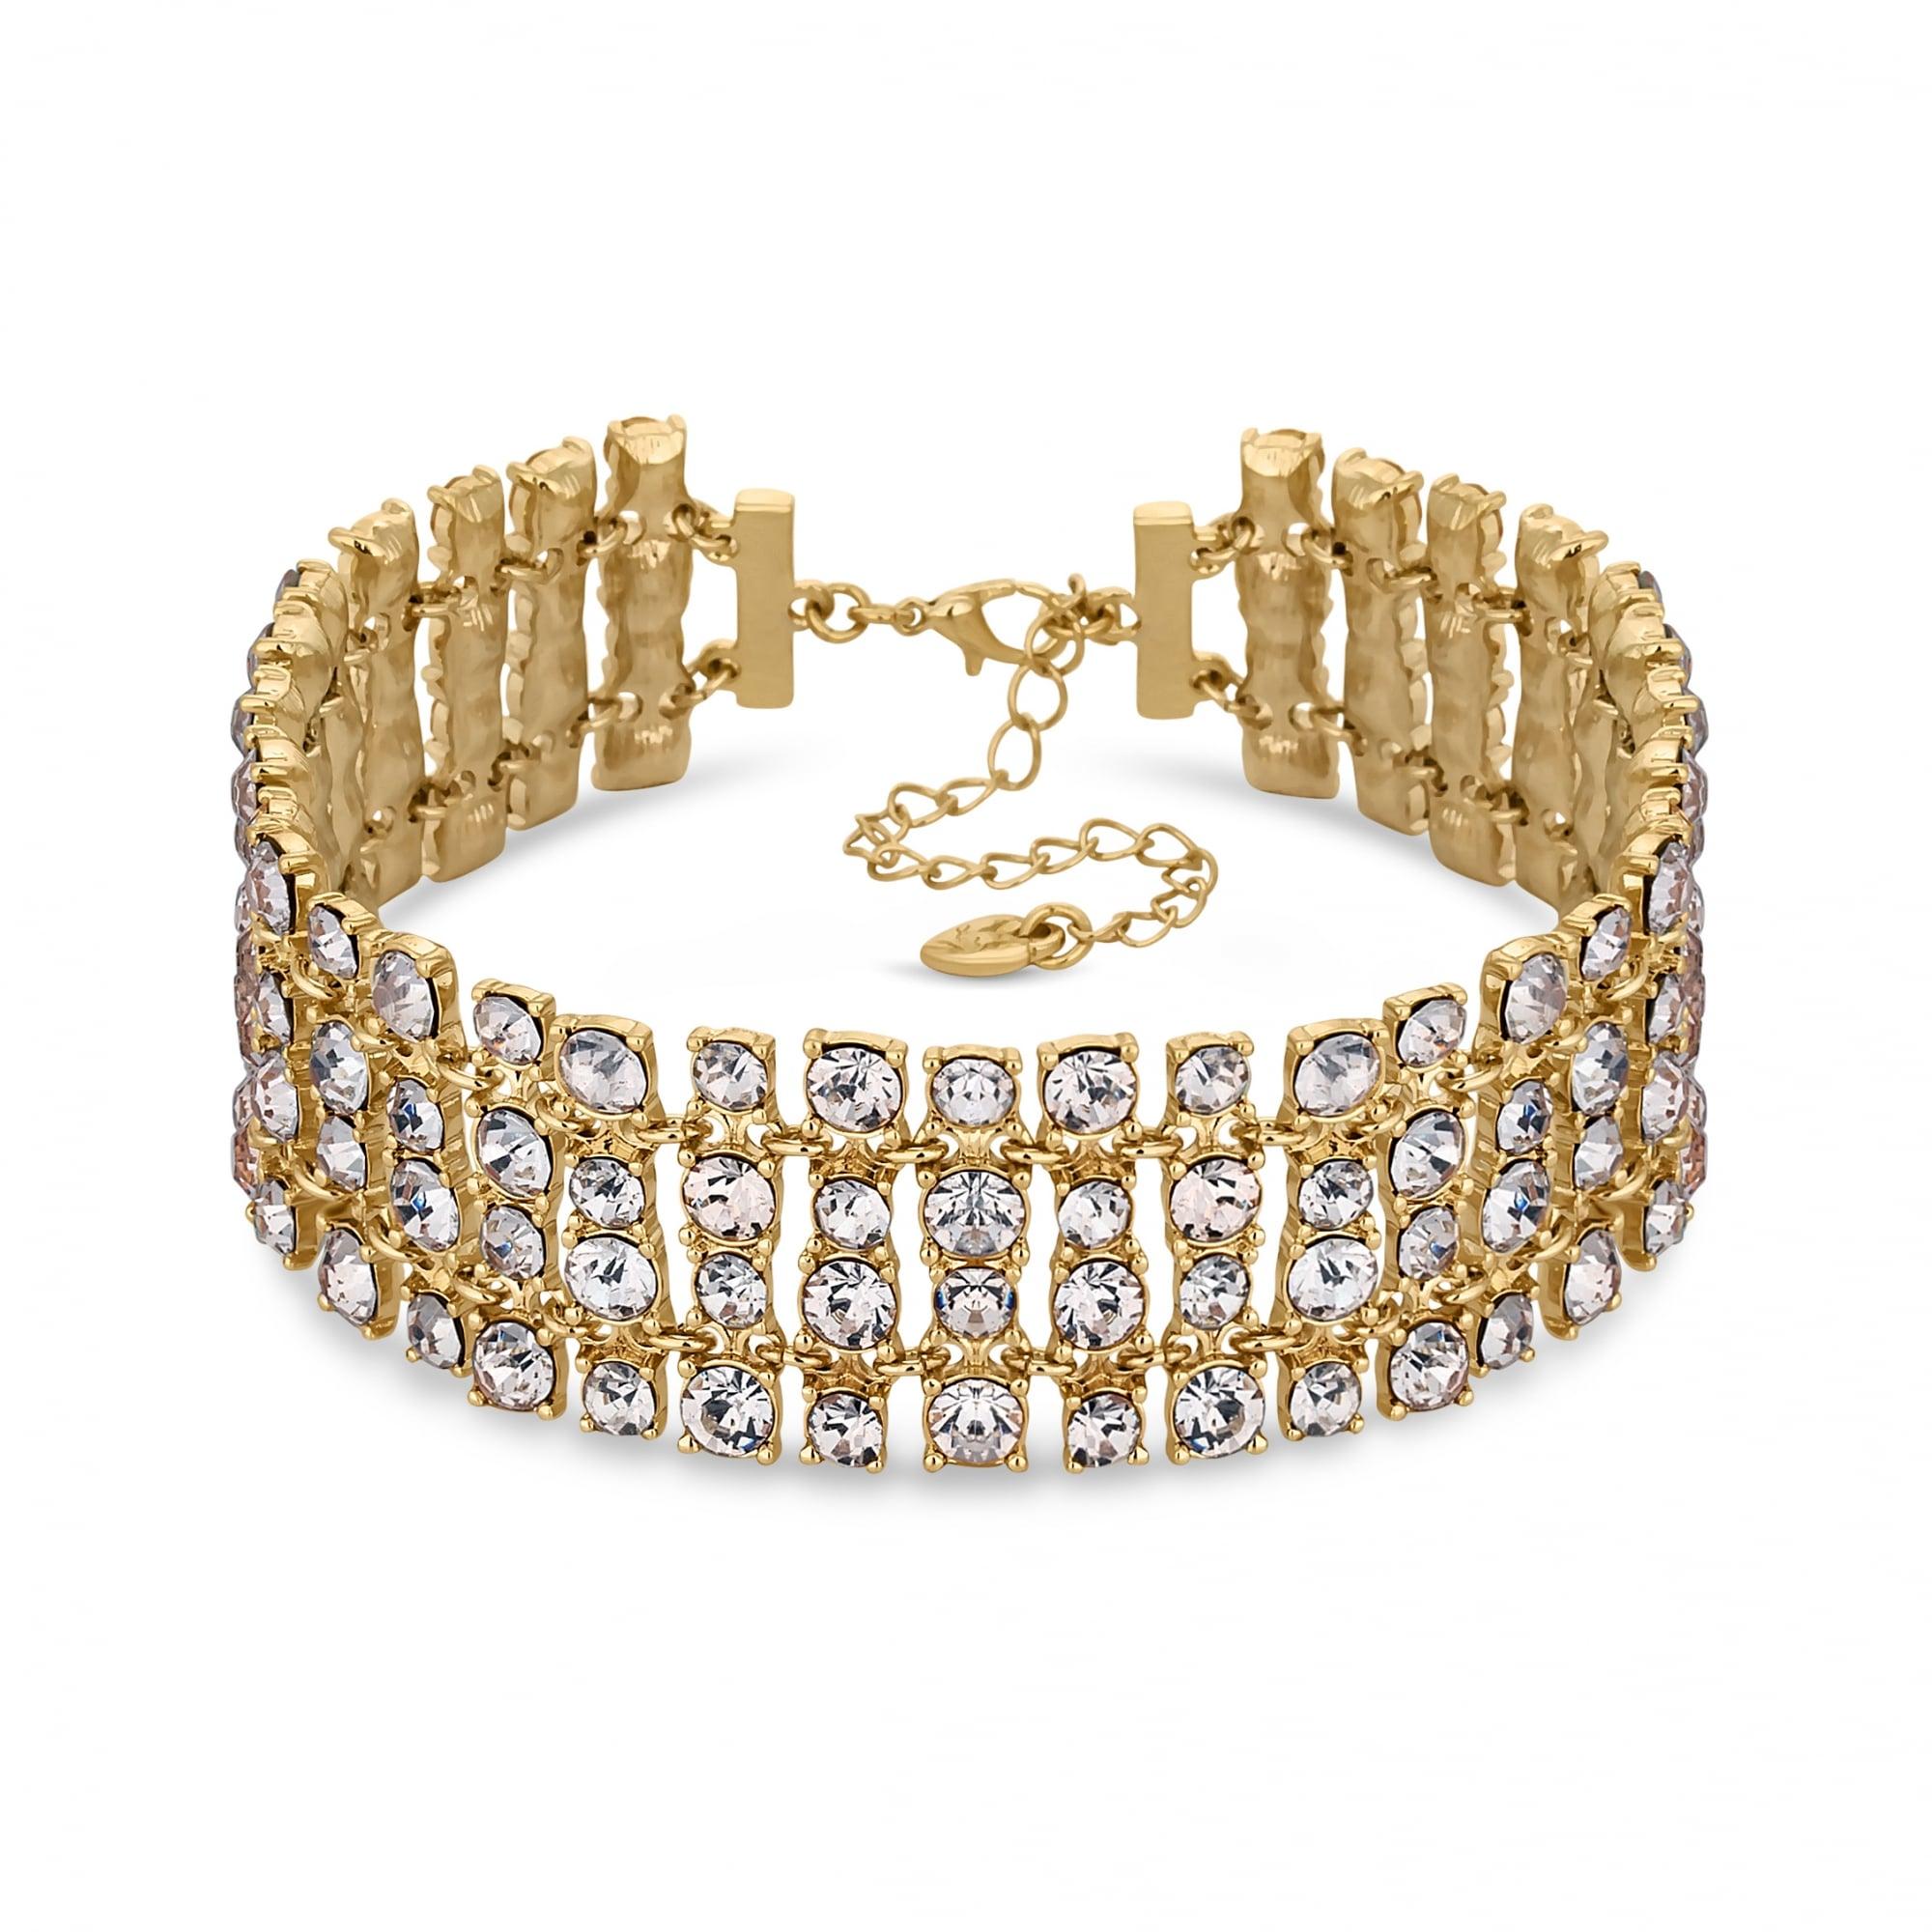 19441da7c26 Lipsy Gold Crystal Statement Choker Necklace - Sale from Jon Richard UK